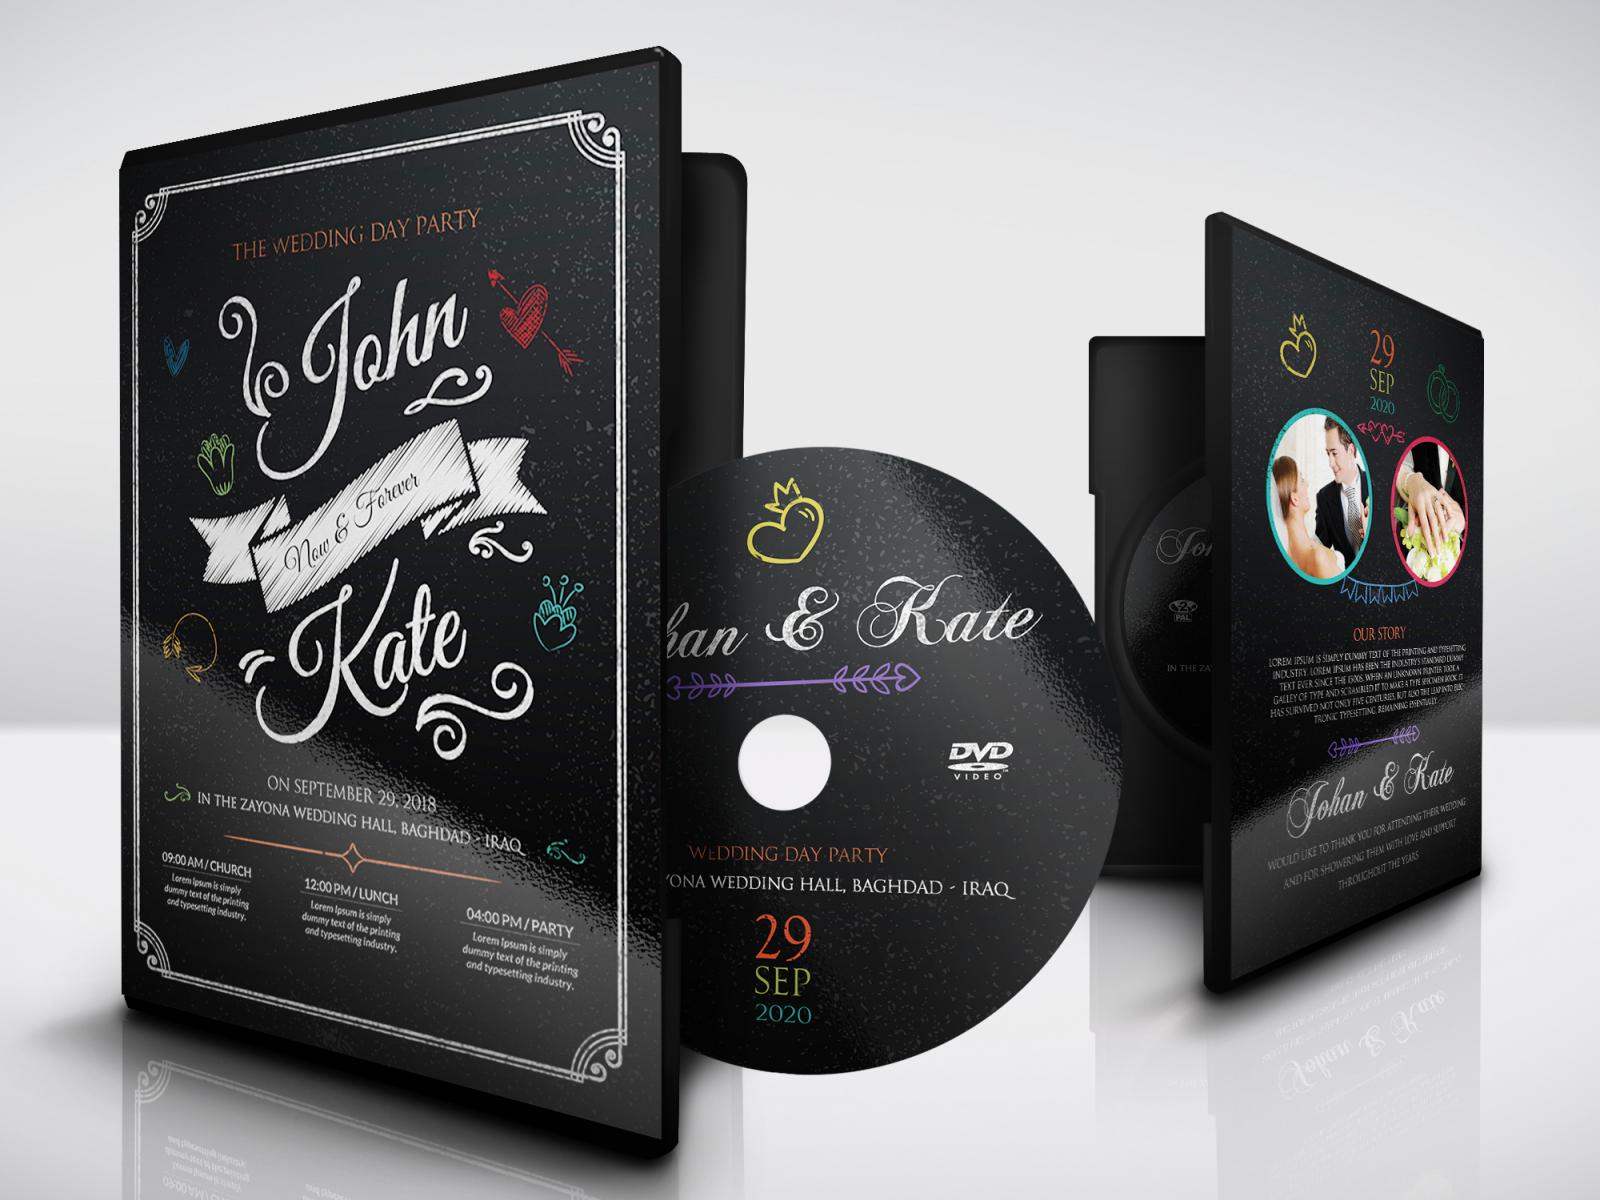 Dvd Cover Design Template from cdn.dribbble.com